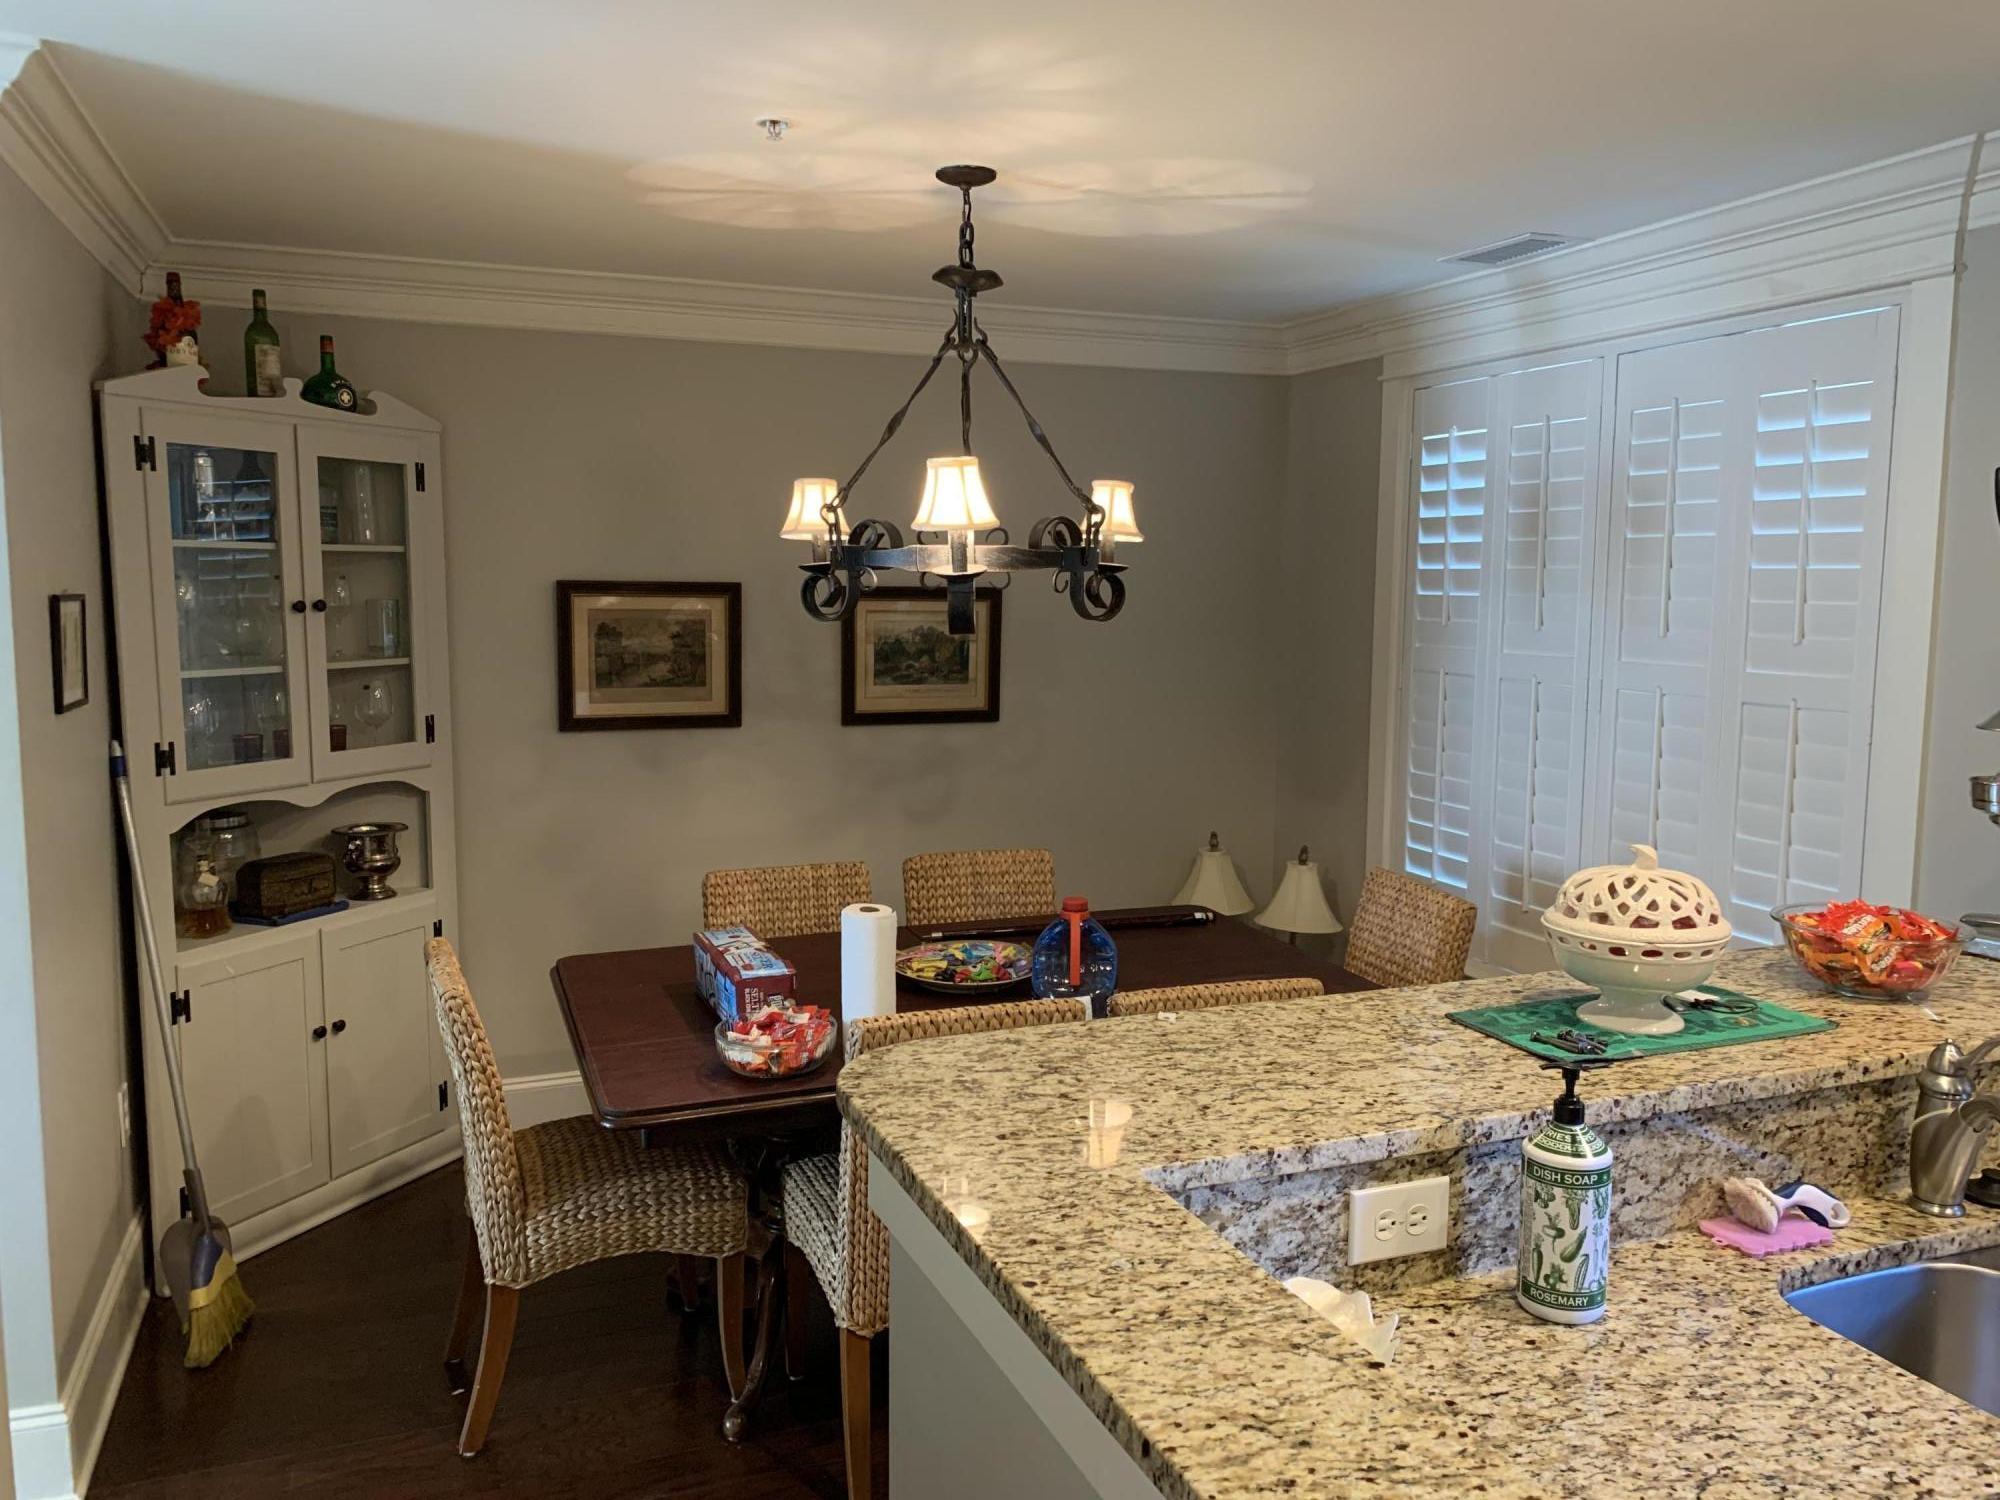 Shelmore Village Homes For Sale - 728 Shelmore, Mount Pleasant, SC - 7